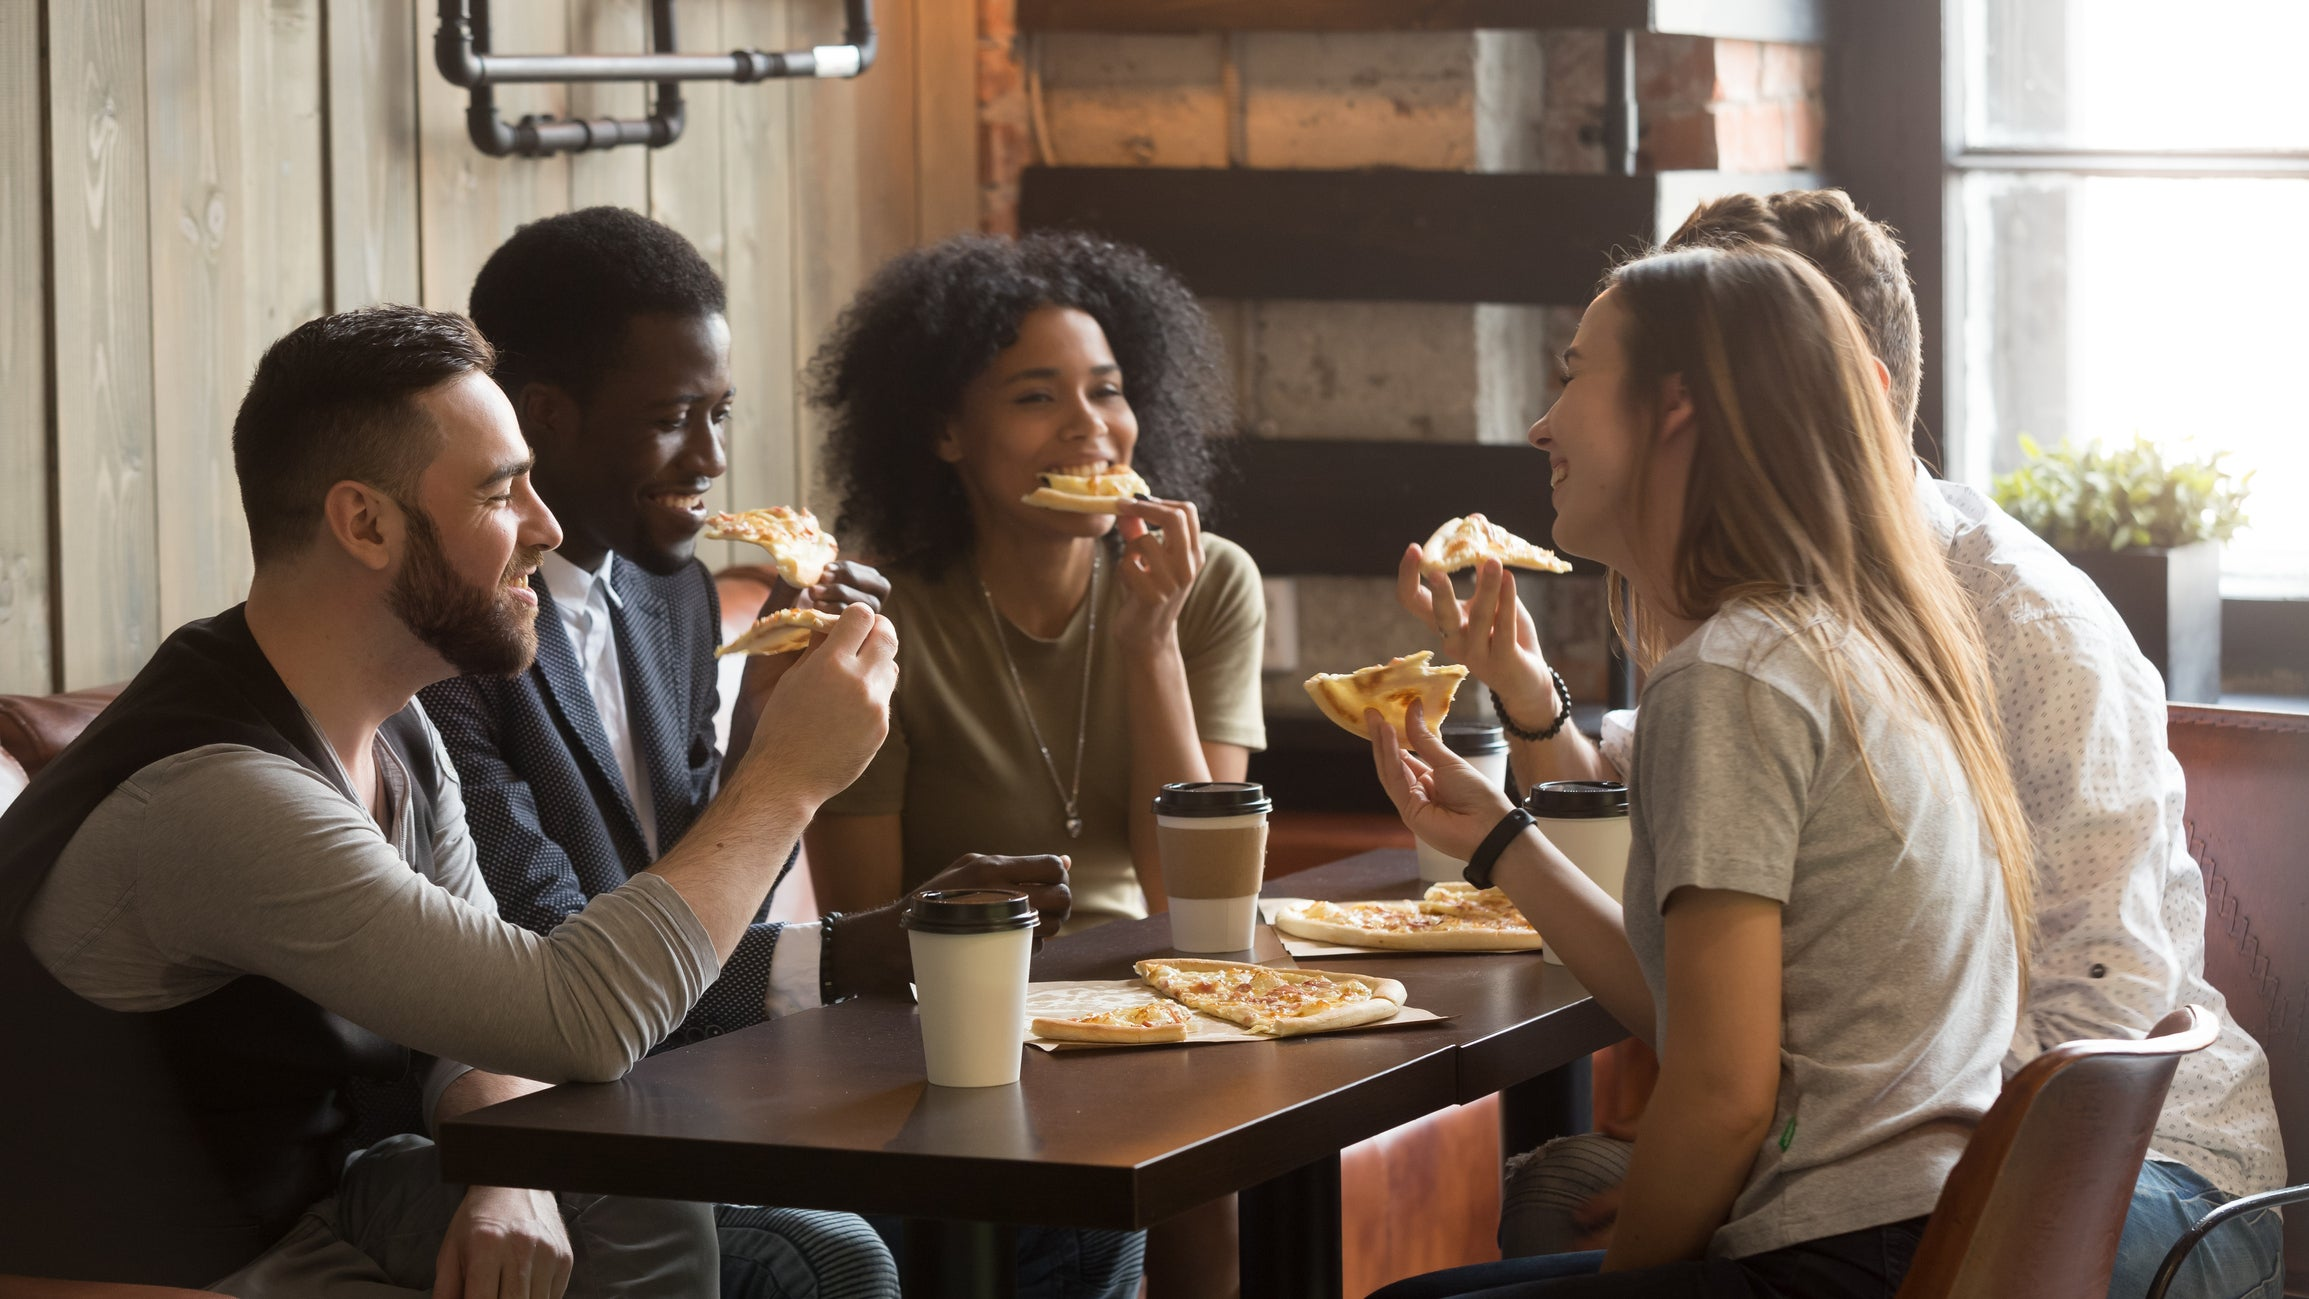 Better Buy: Starbucks vs. Domino's Pizza